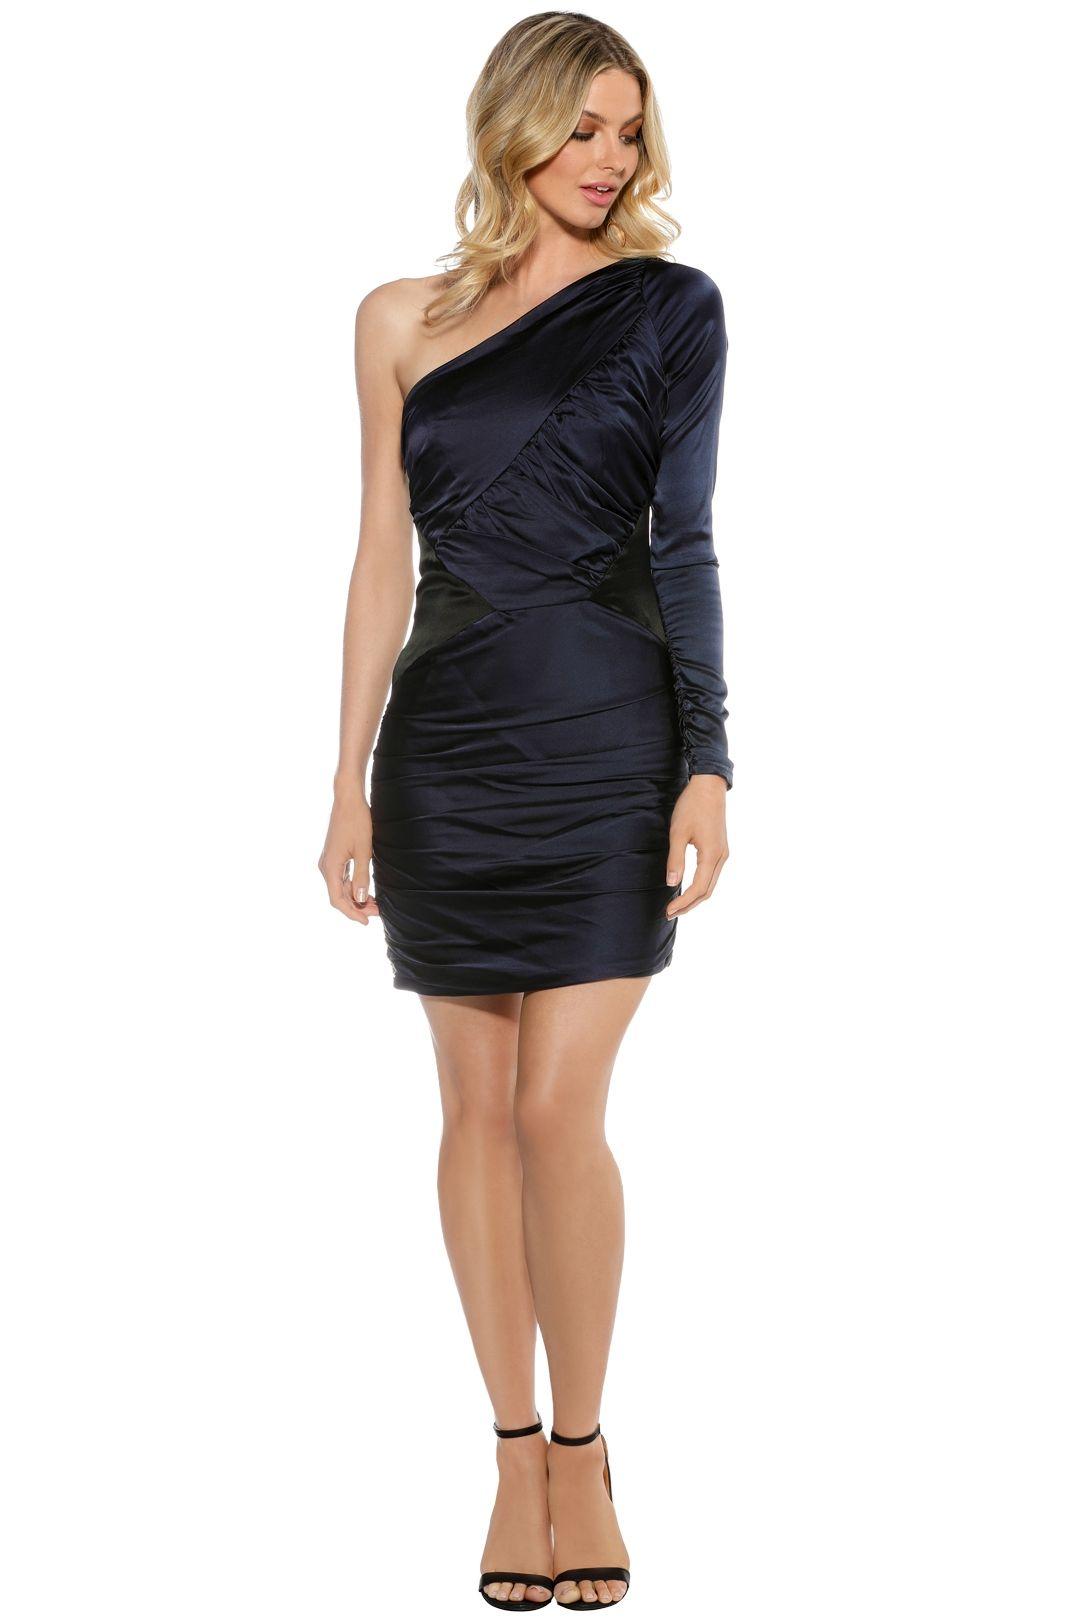 Nicola Finetti - Asymmetric Ruffle Dress - Navy - Front